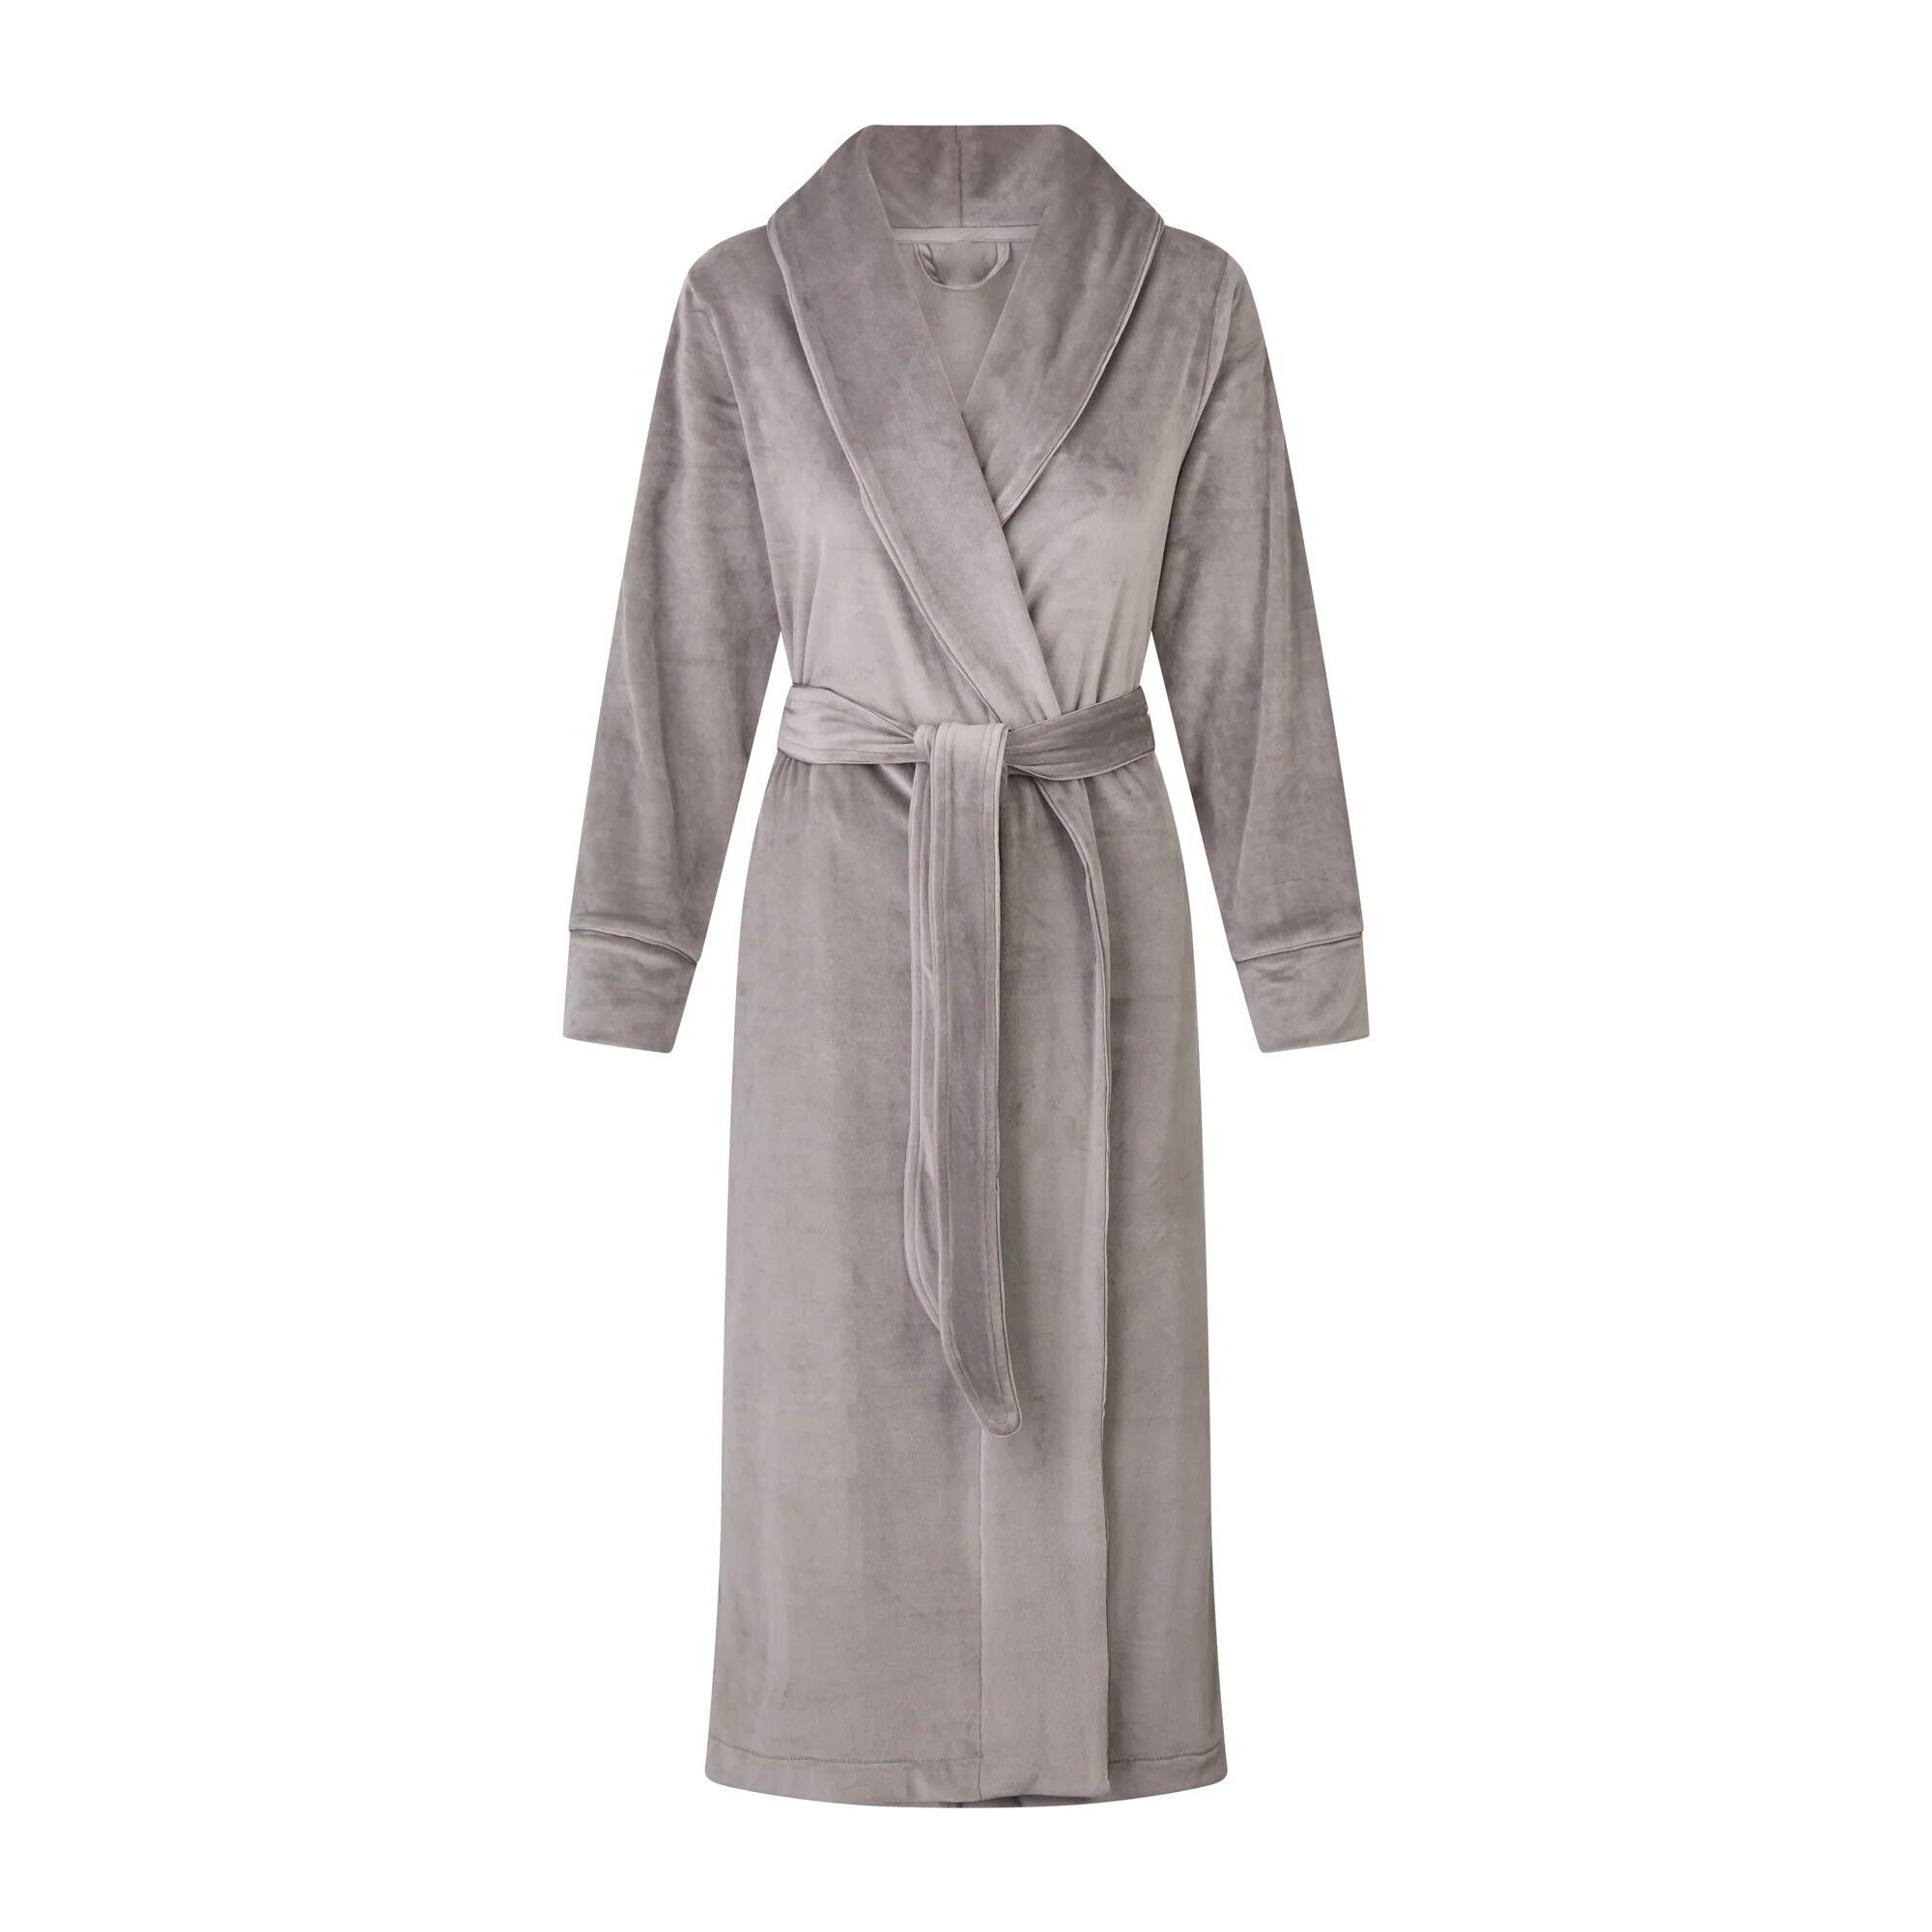 SKIMS Women's Velour Long Robe - Gray - Size XXS; Gray